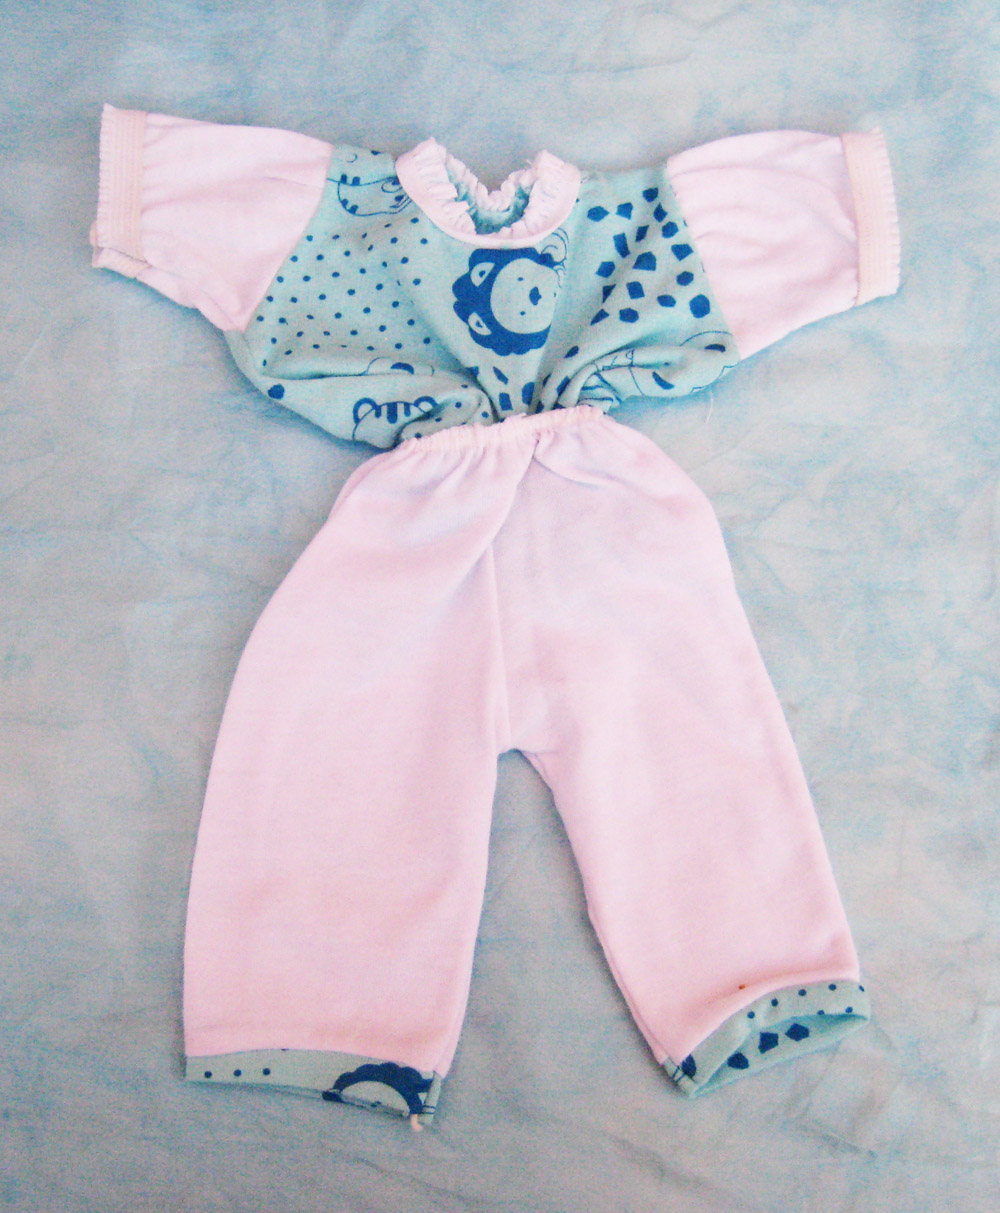 pijama-azul-claro-para-muneco-waldorf